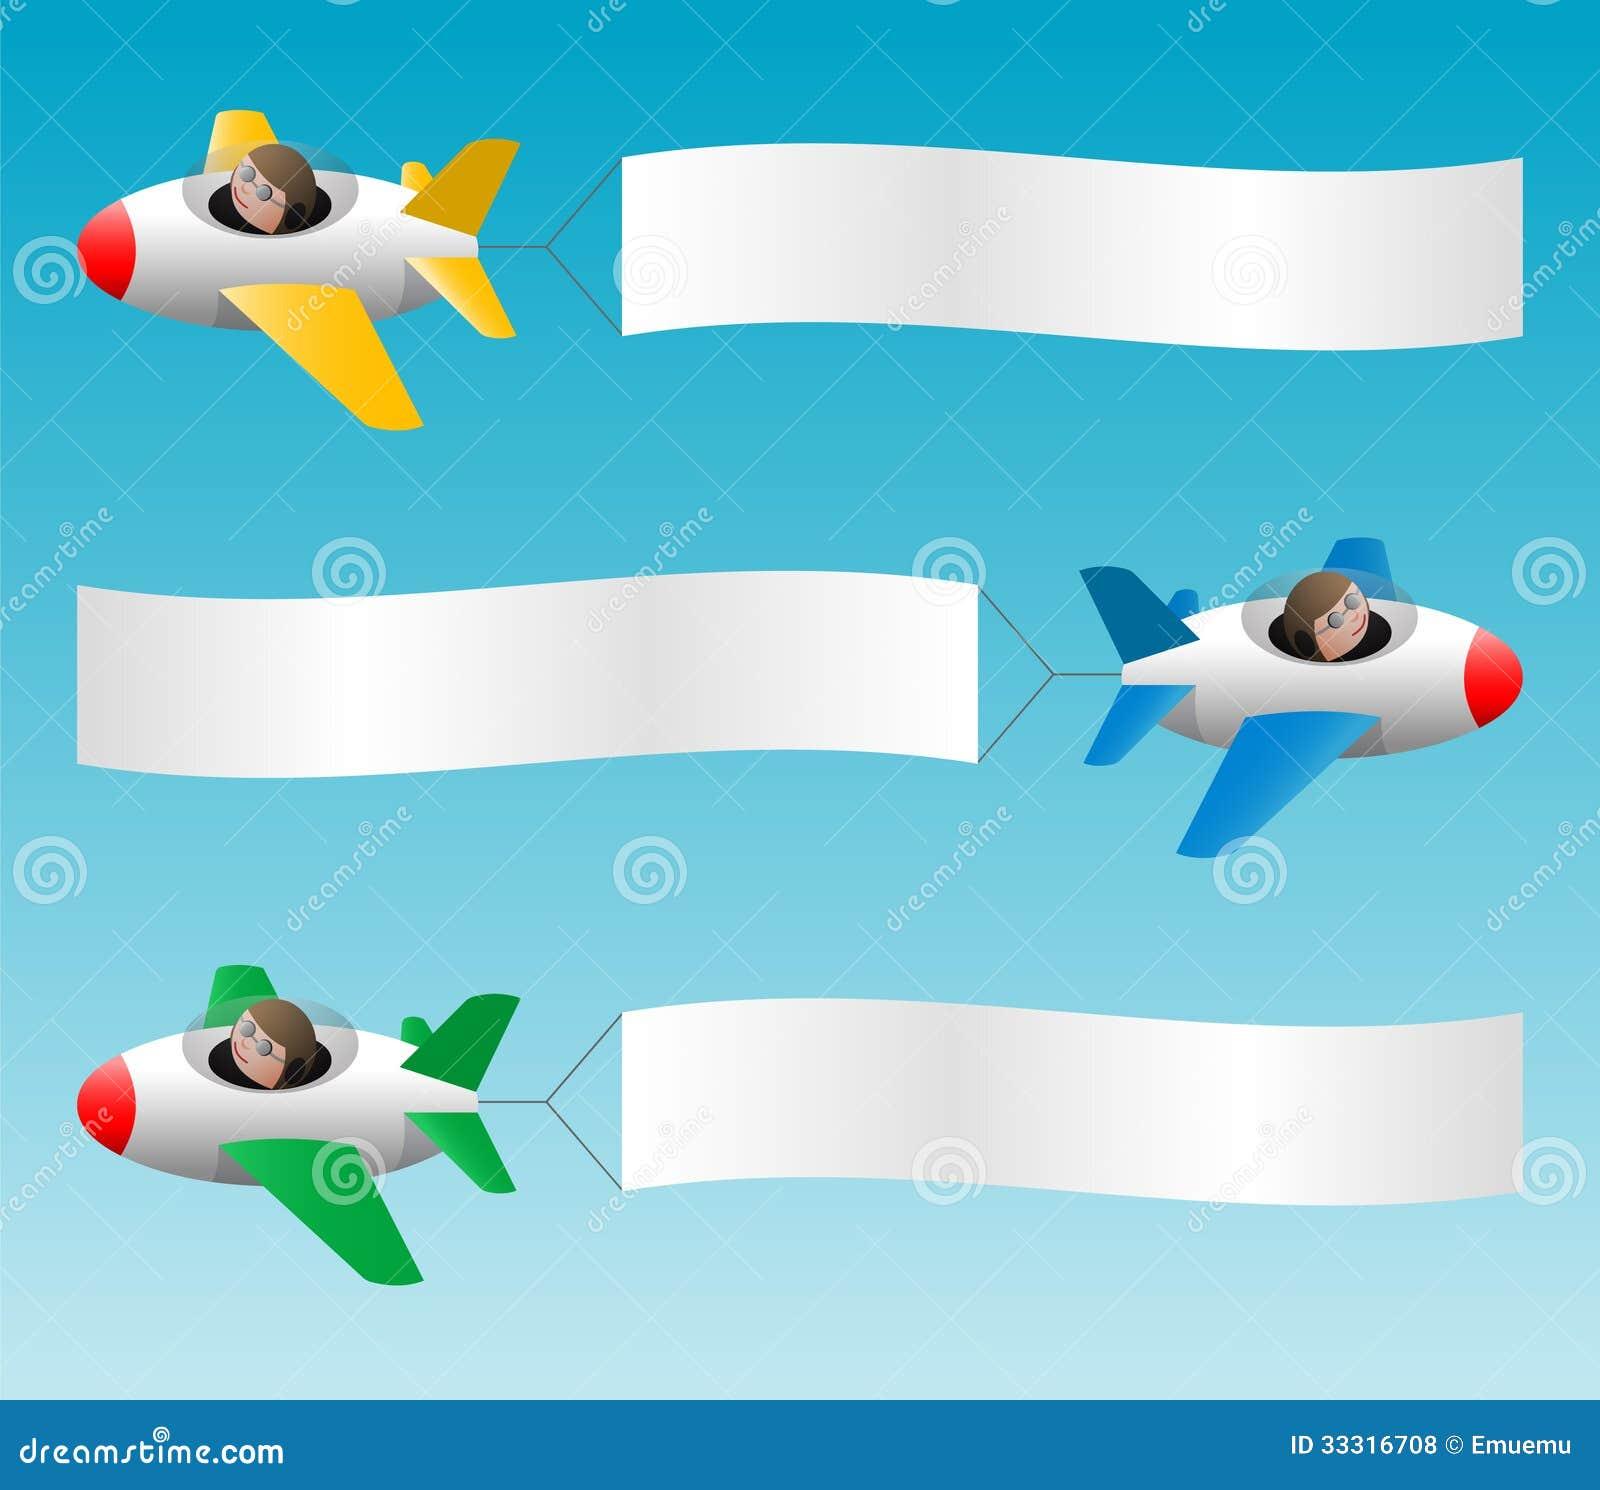 Three Planes Pull Banners Stock Vector Illustration Of Cartoon